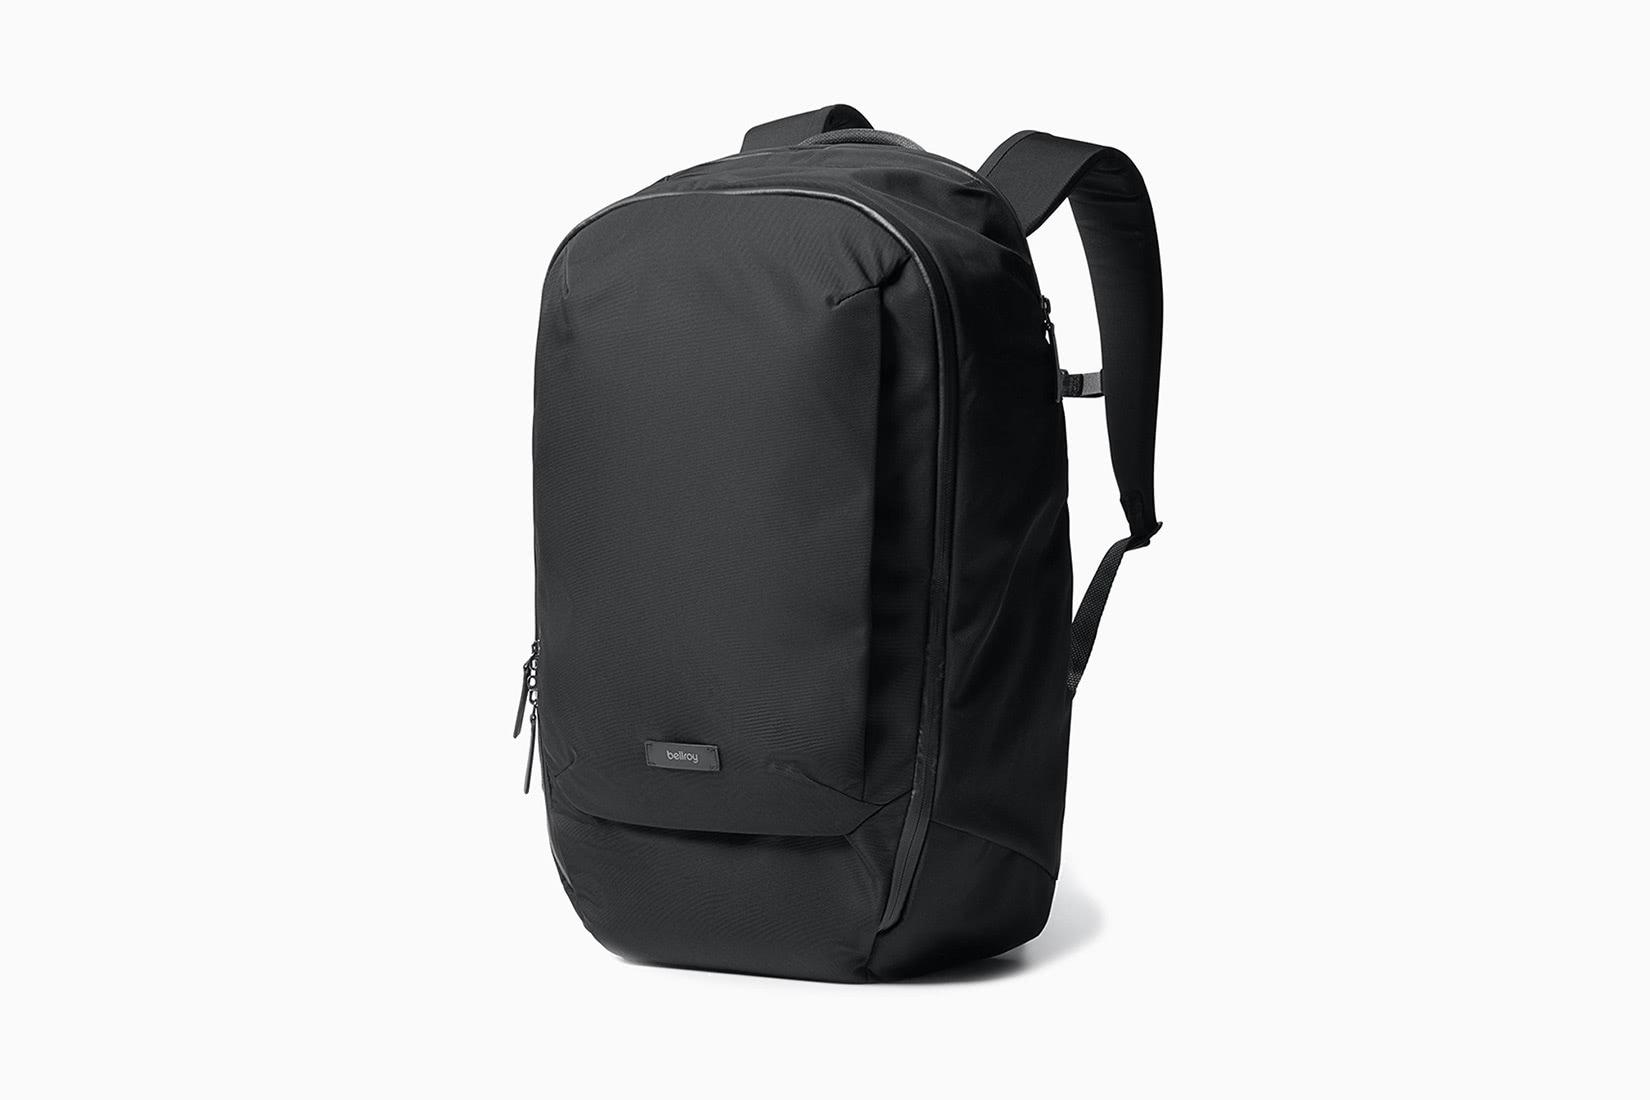 best travel backpack bellroy transit plus - Luxe Digital